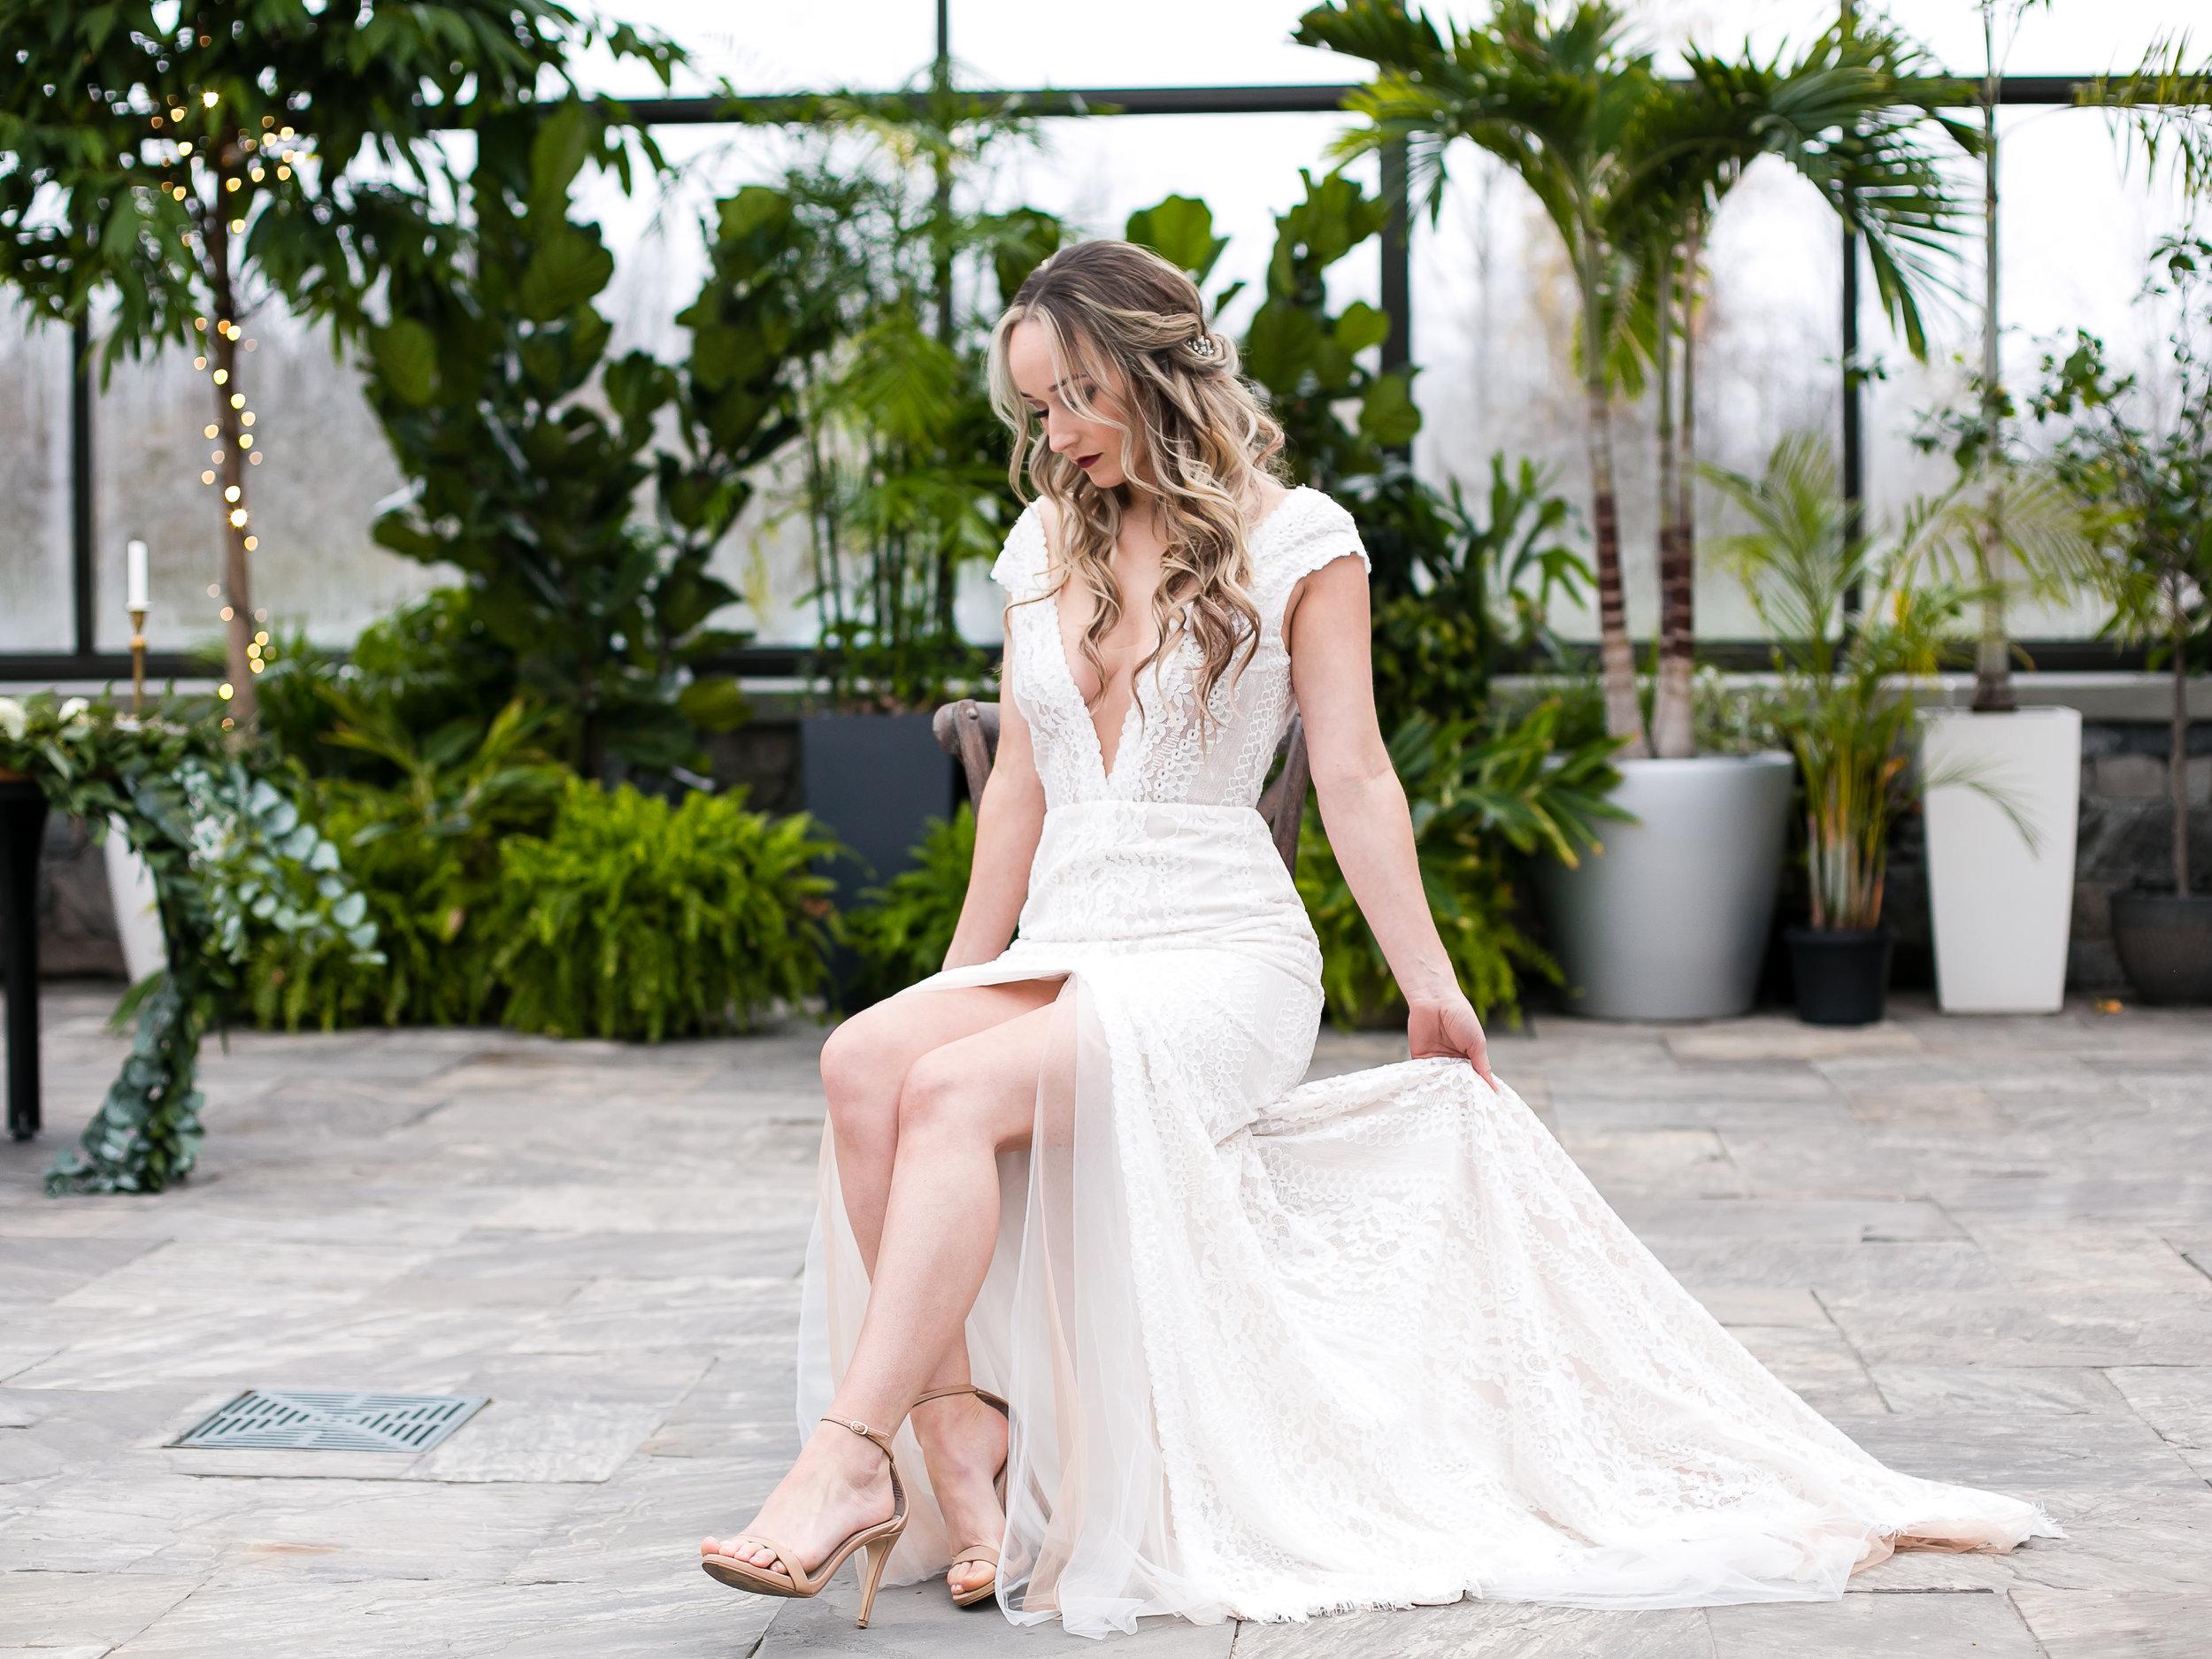 Aquatopia-Wedding-Ottawa-Wedding-Photographer-Stephanie-Mason-Photography-358.jpg